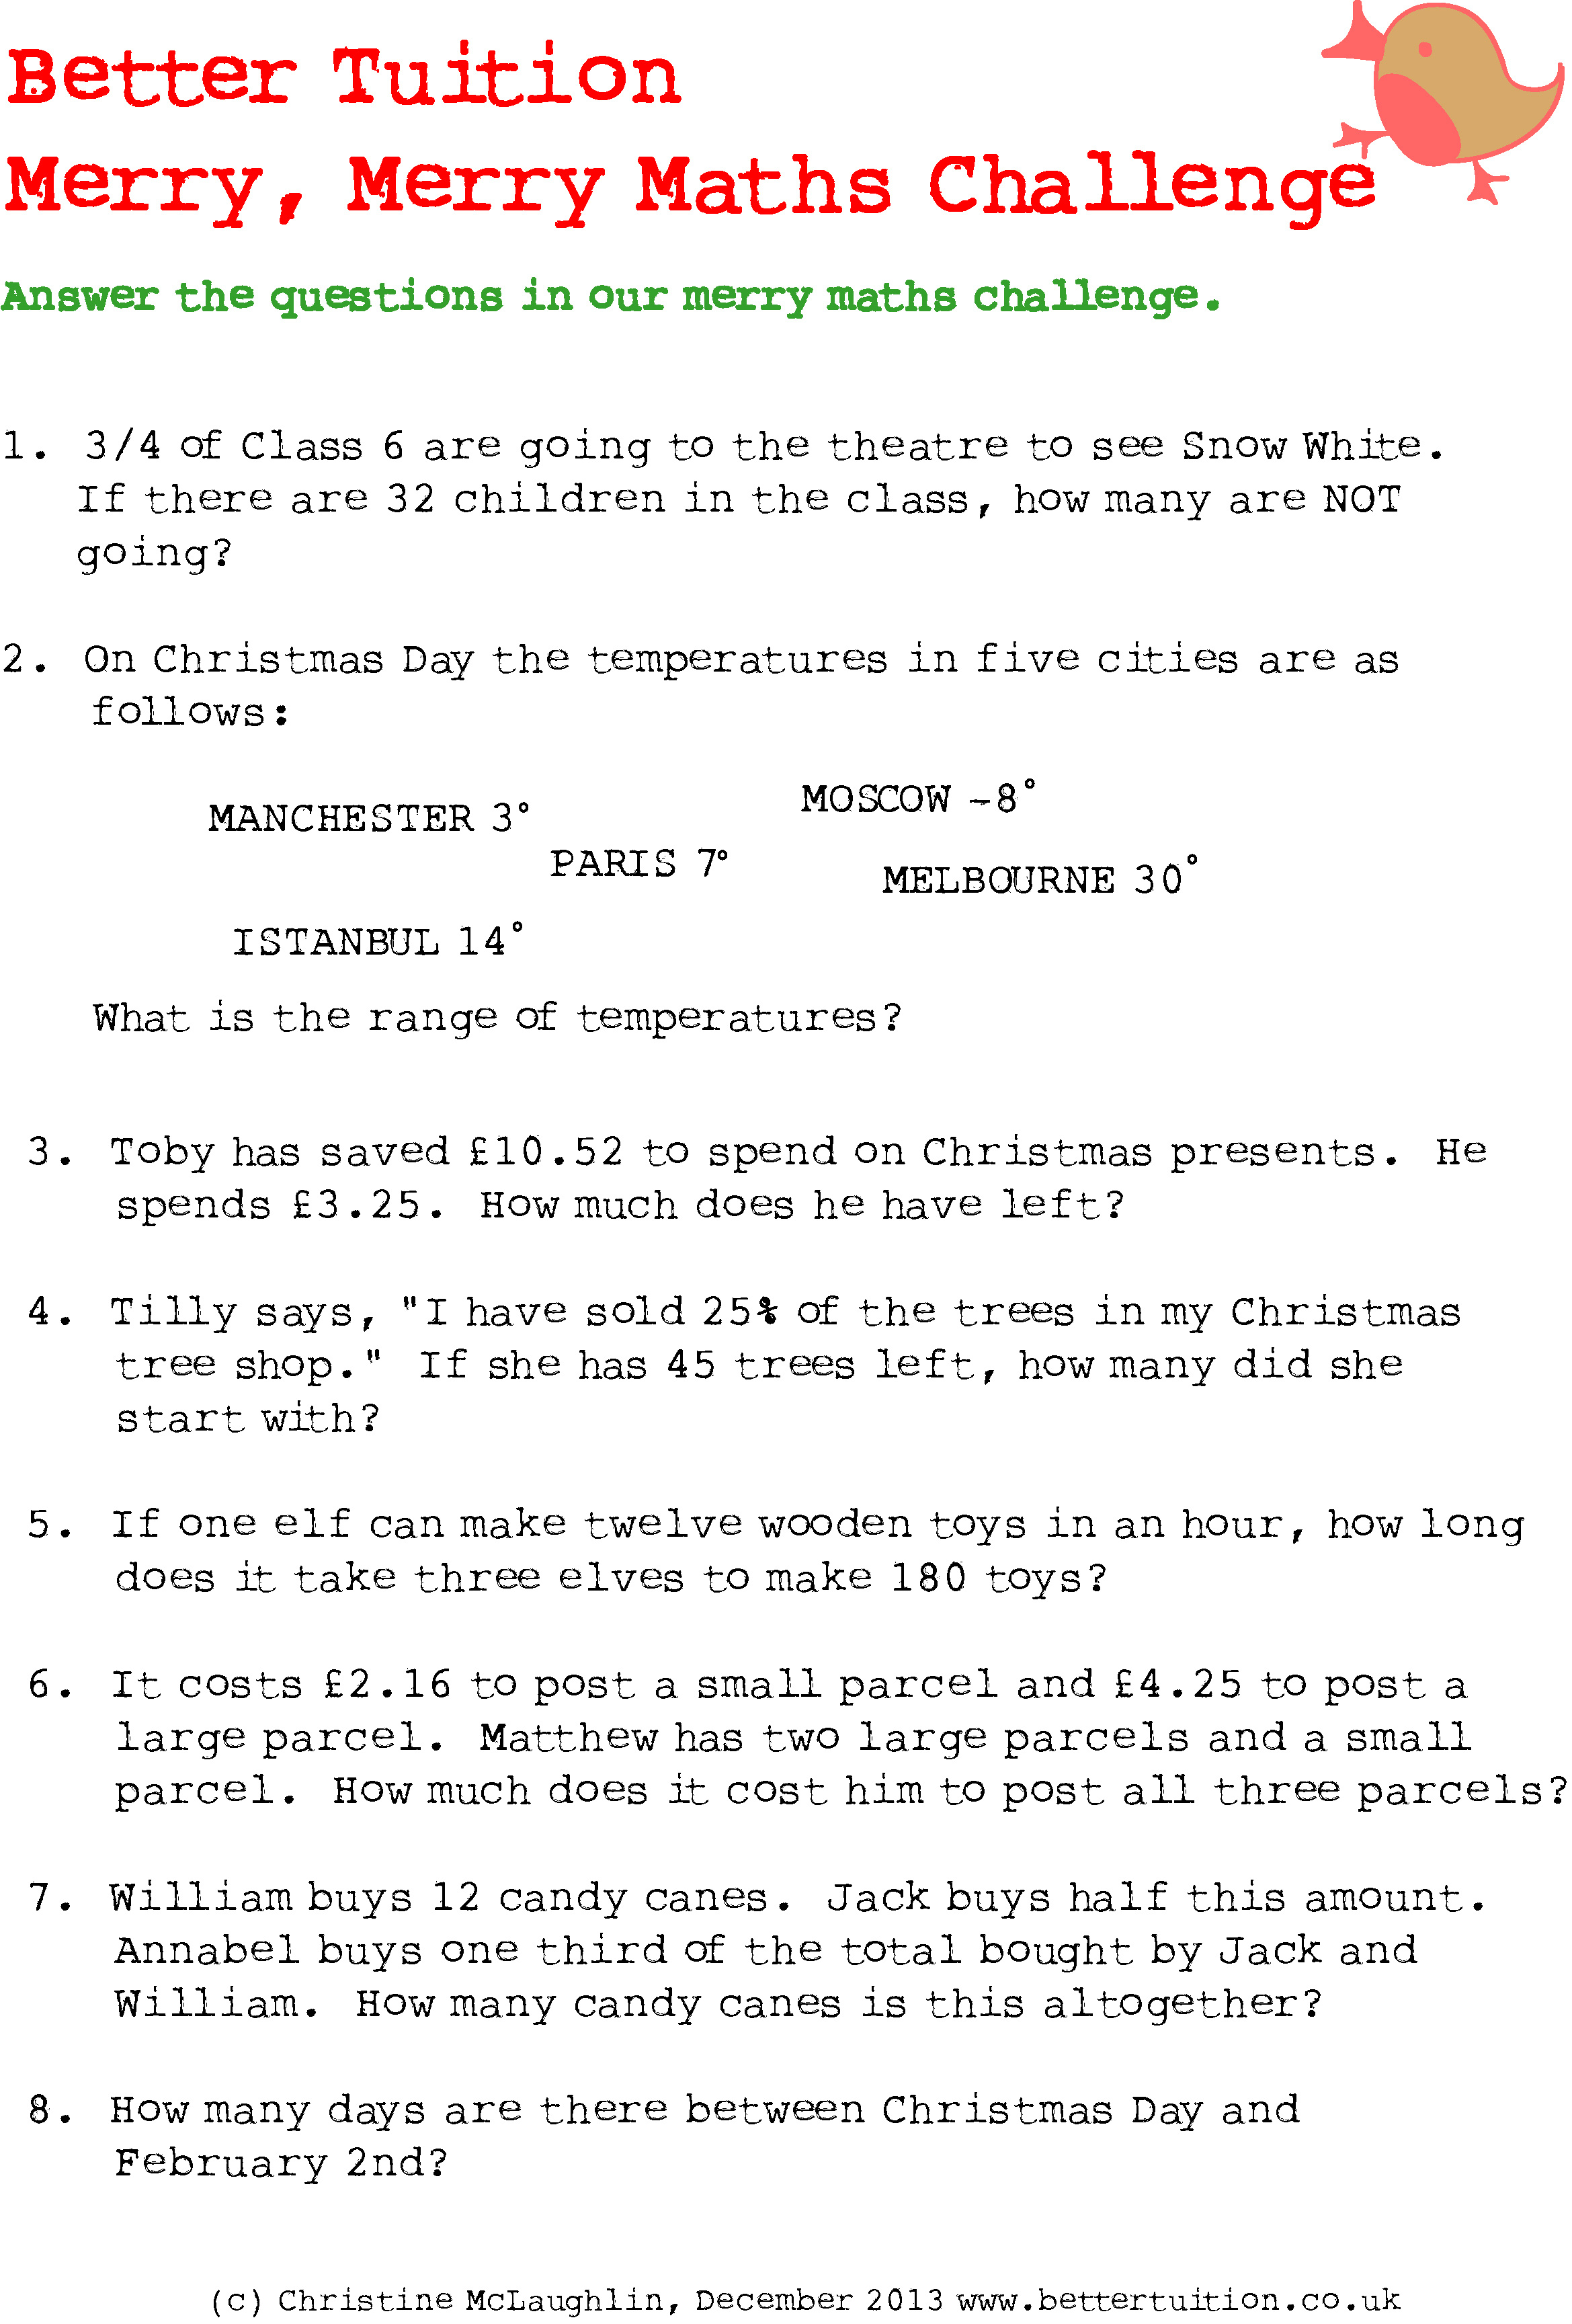 December 3Rd: Christmas Maths Problems - Better Tuition